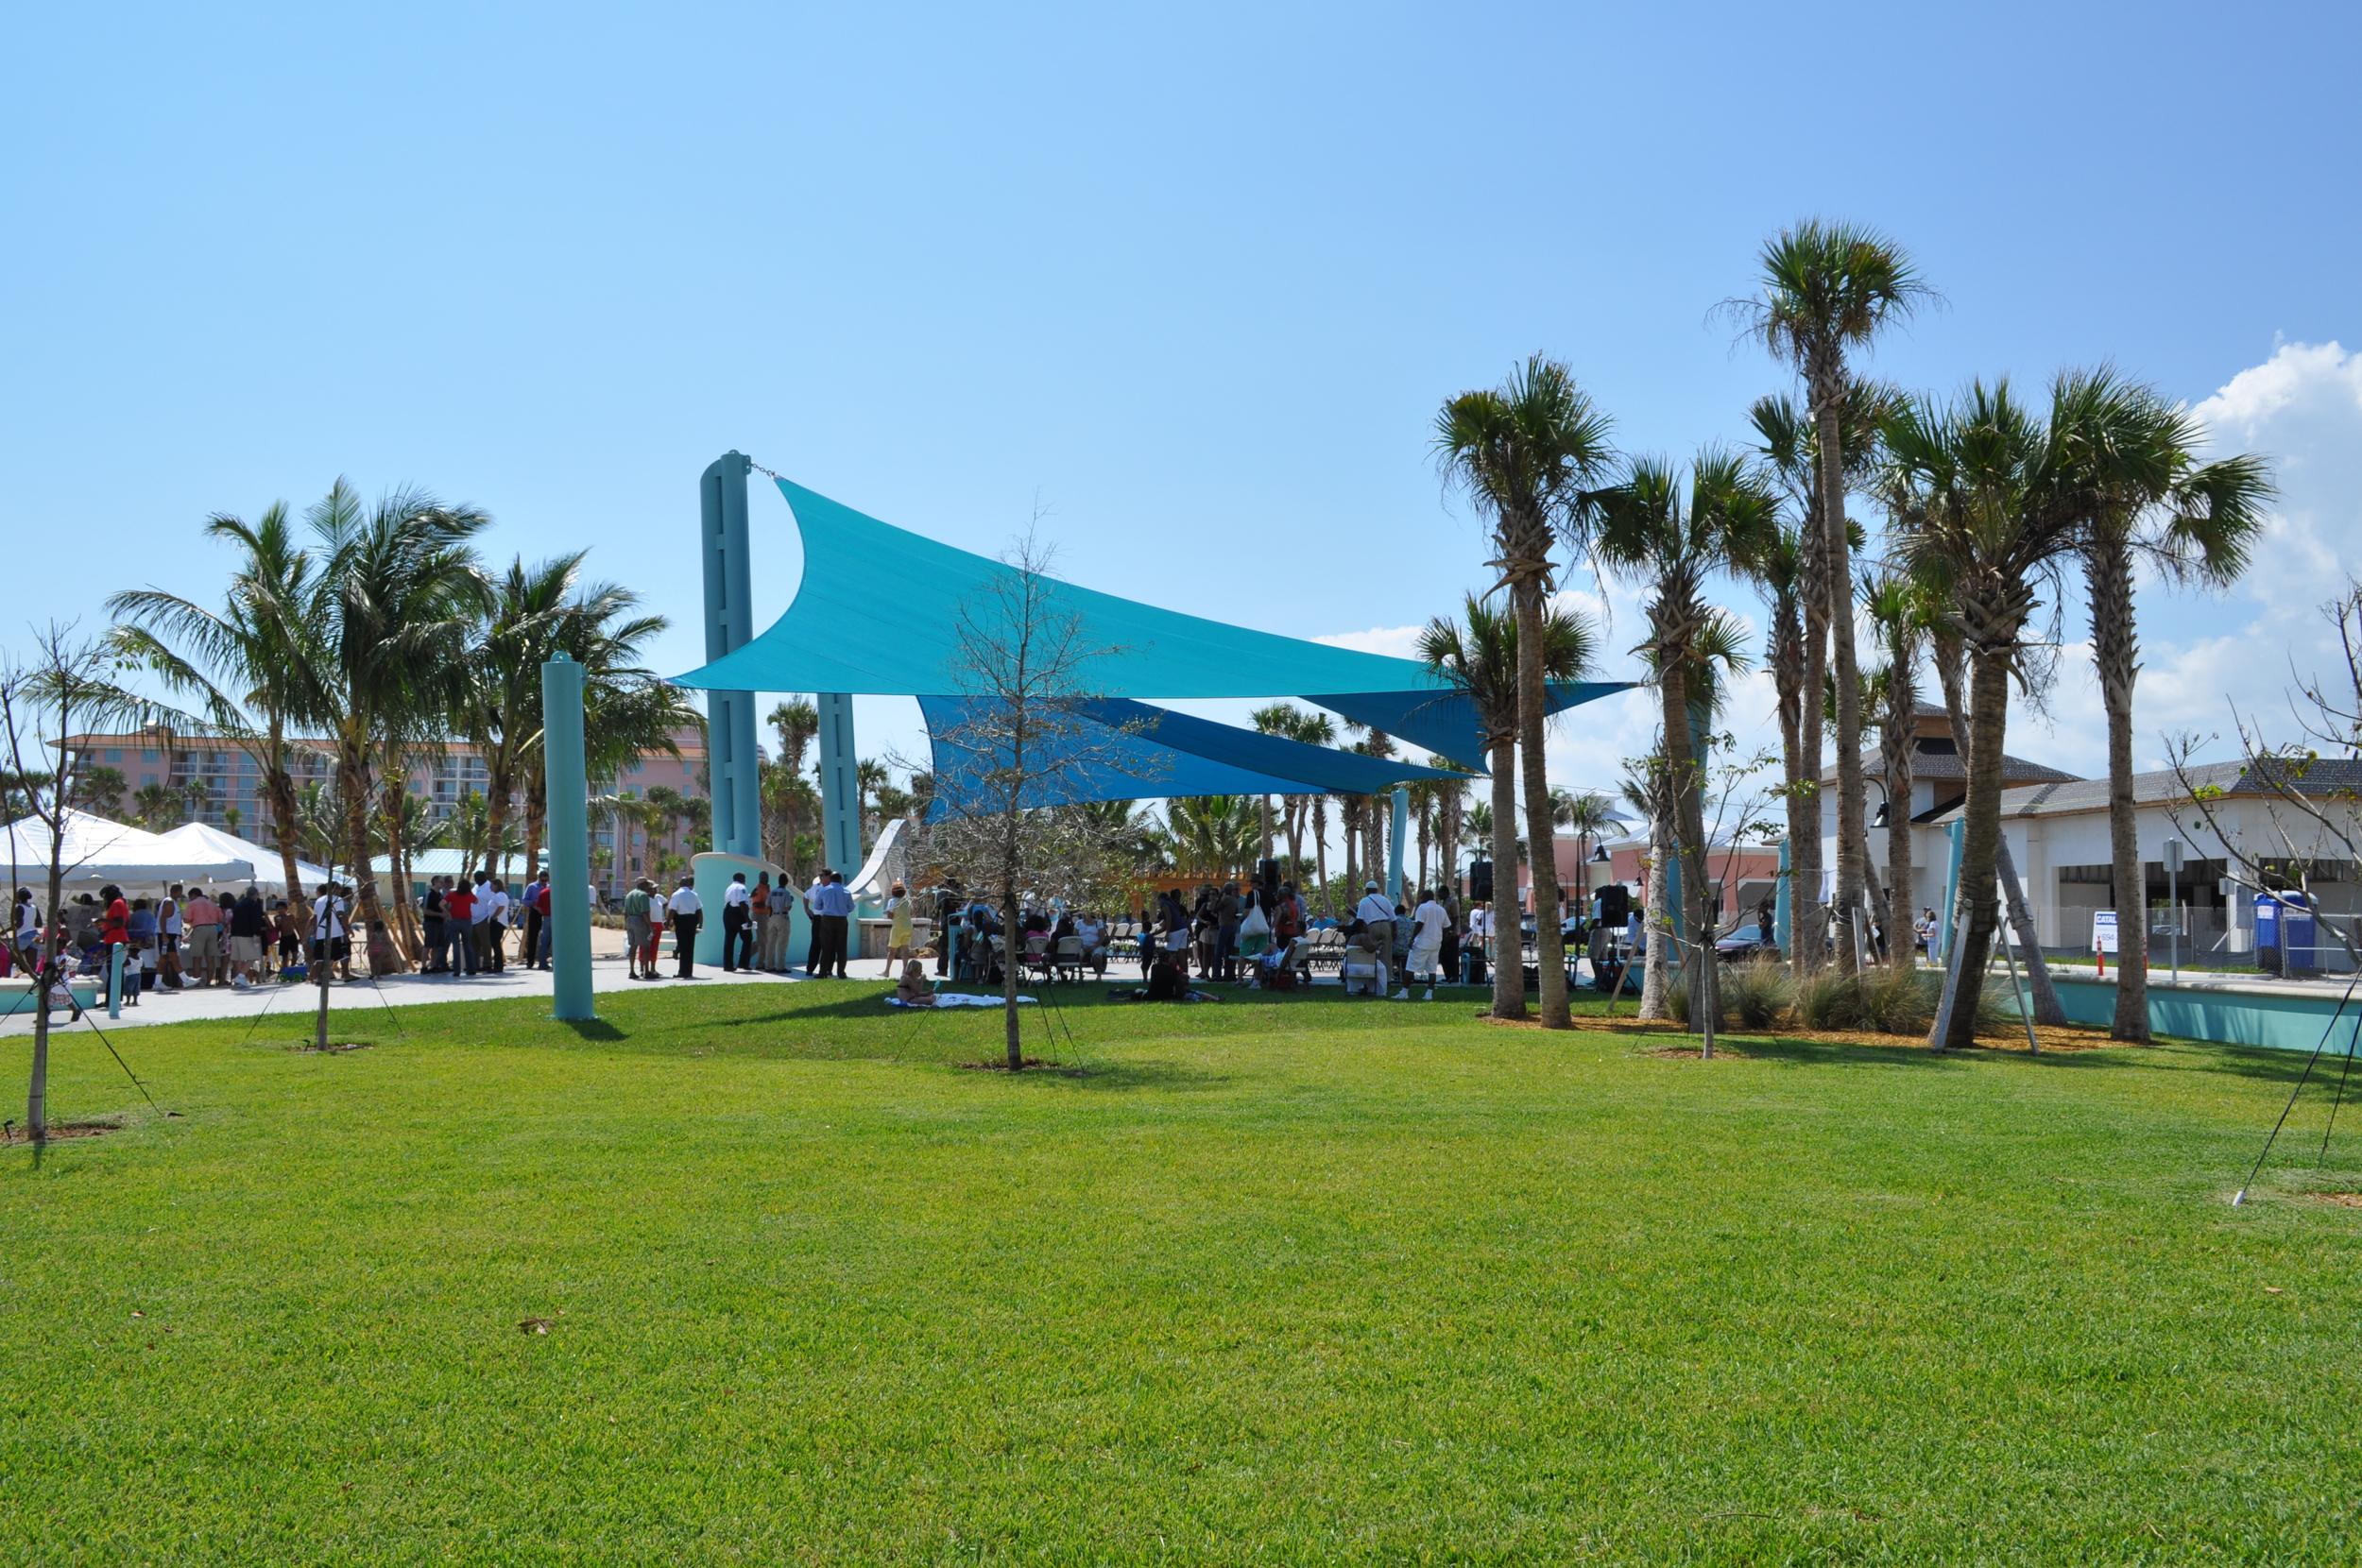 City of Riviera Beach Municipal Beach Park Ocean Mall Grand Opening Events Plaza.jpg